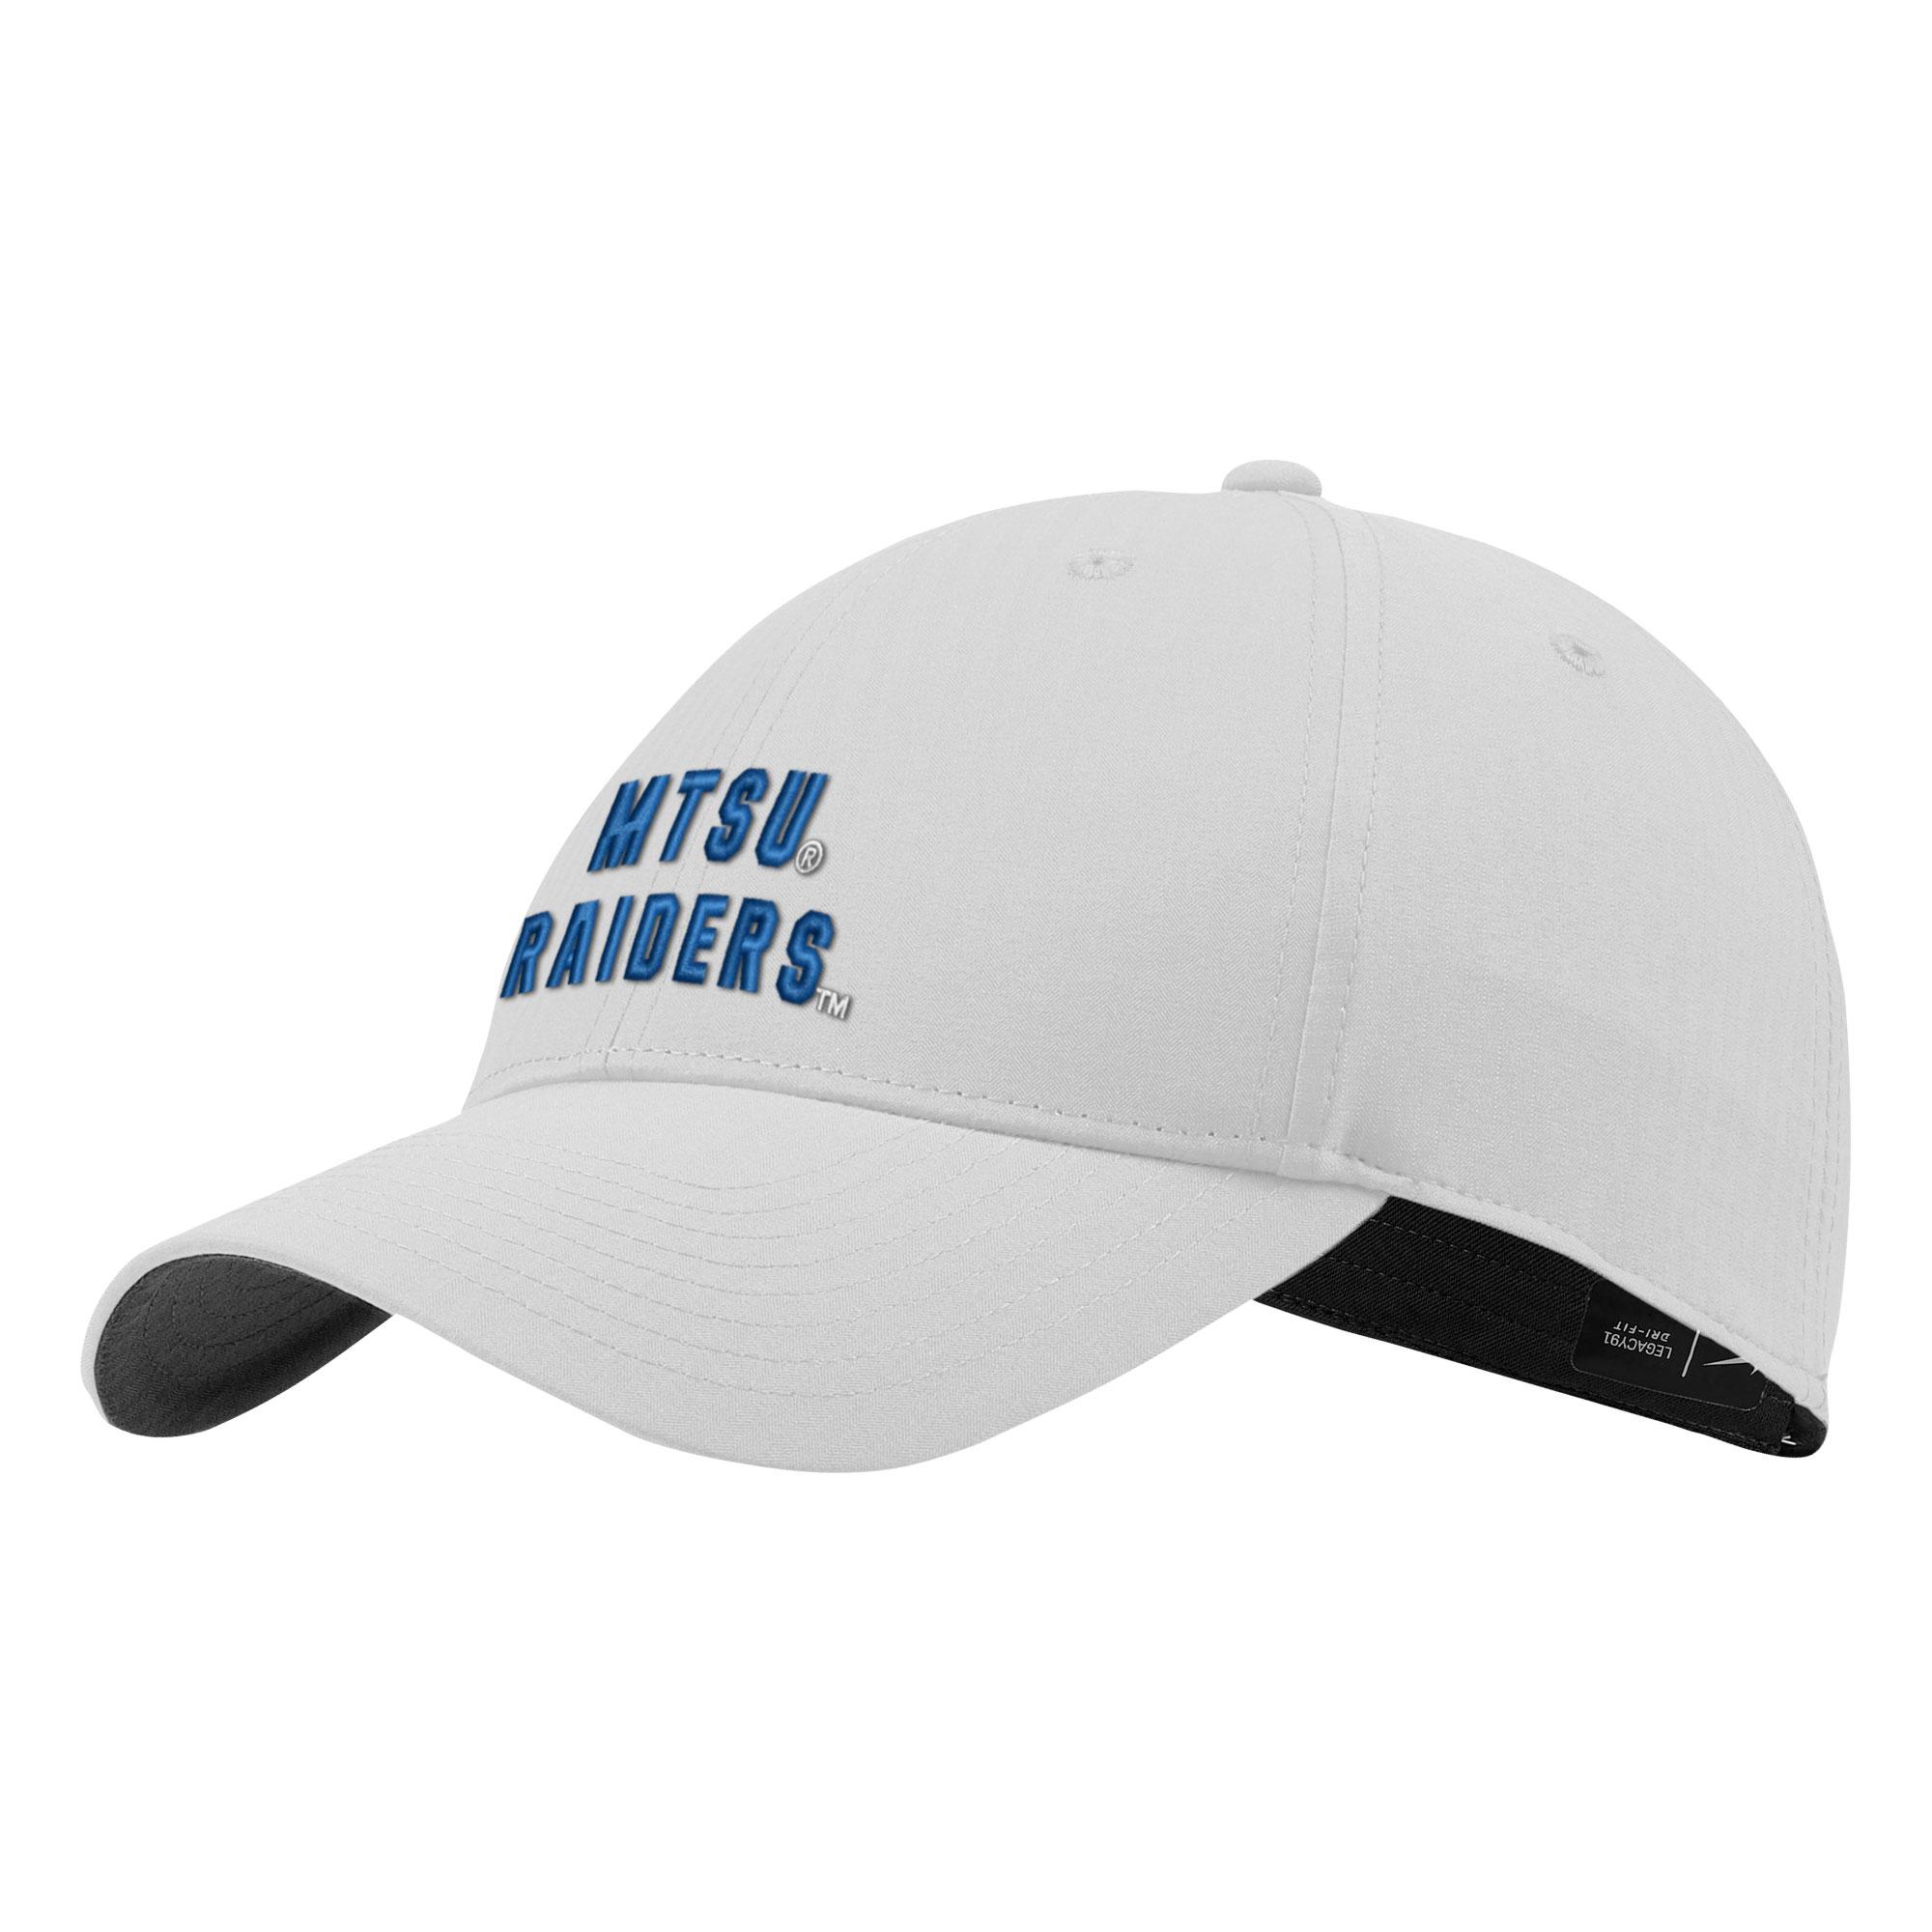 MTSU Raiders Nike® Tech Cap